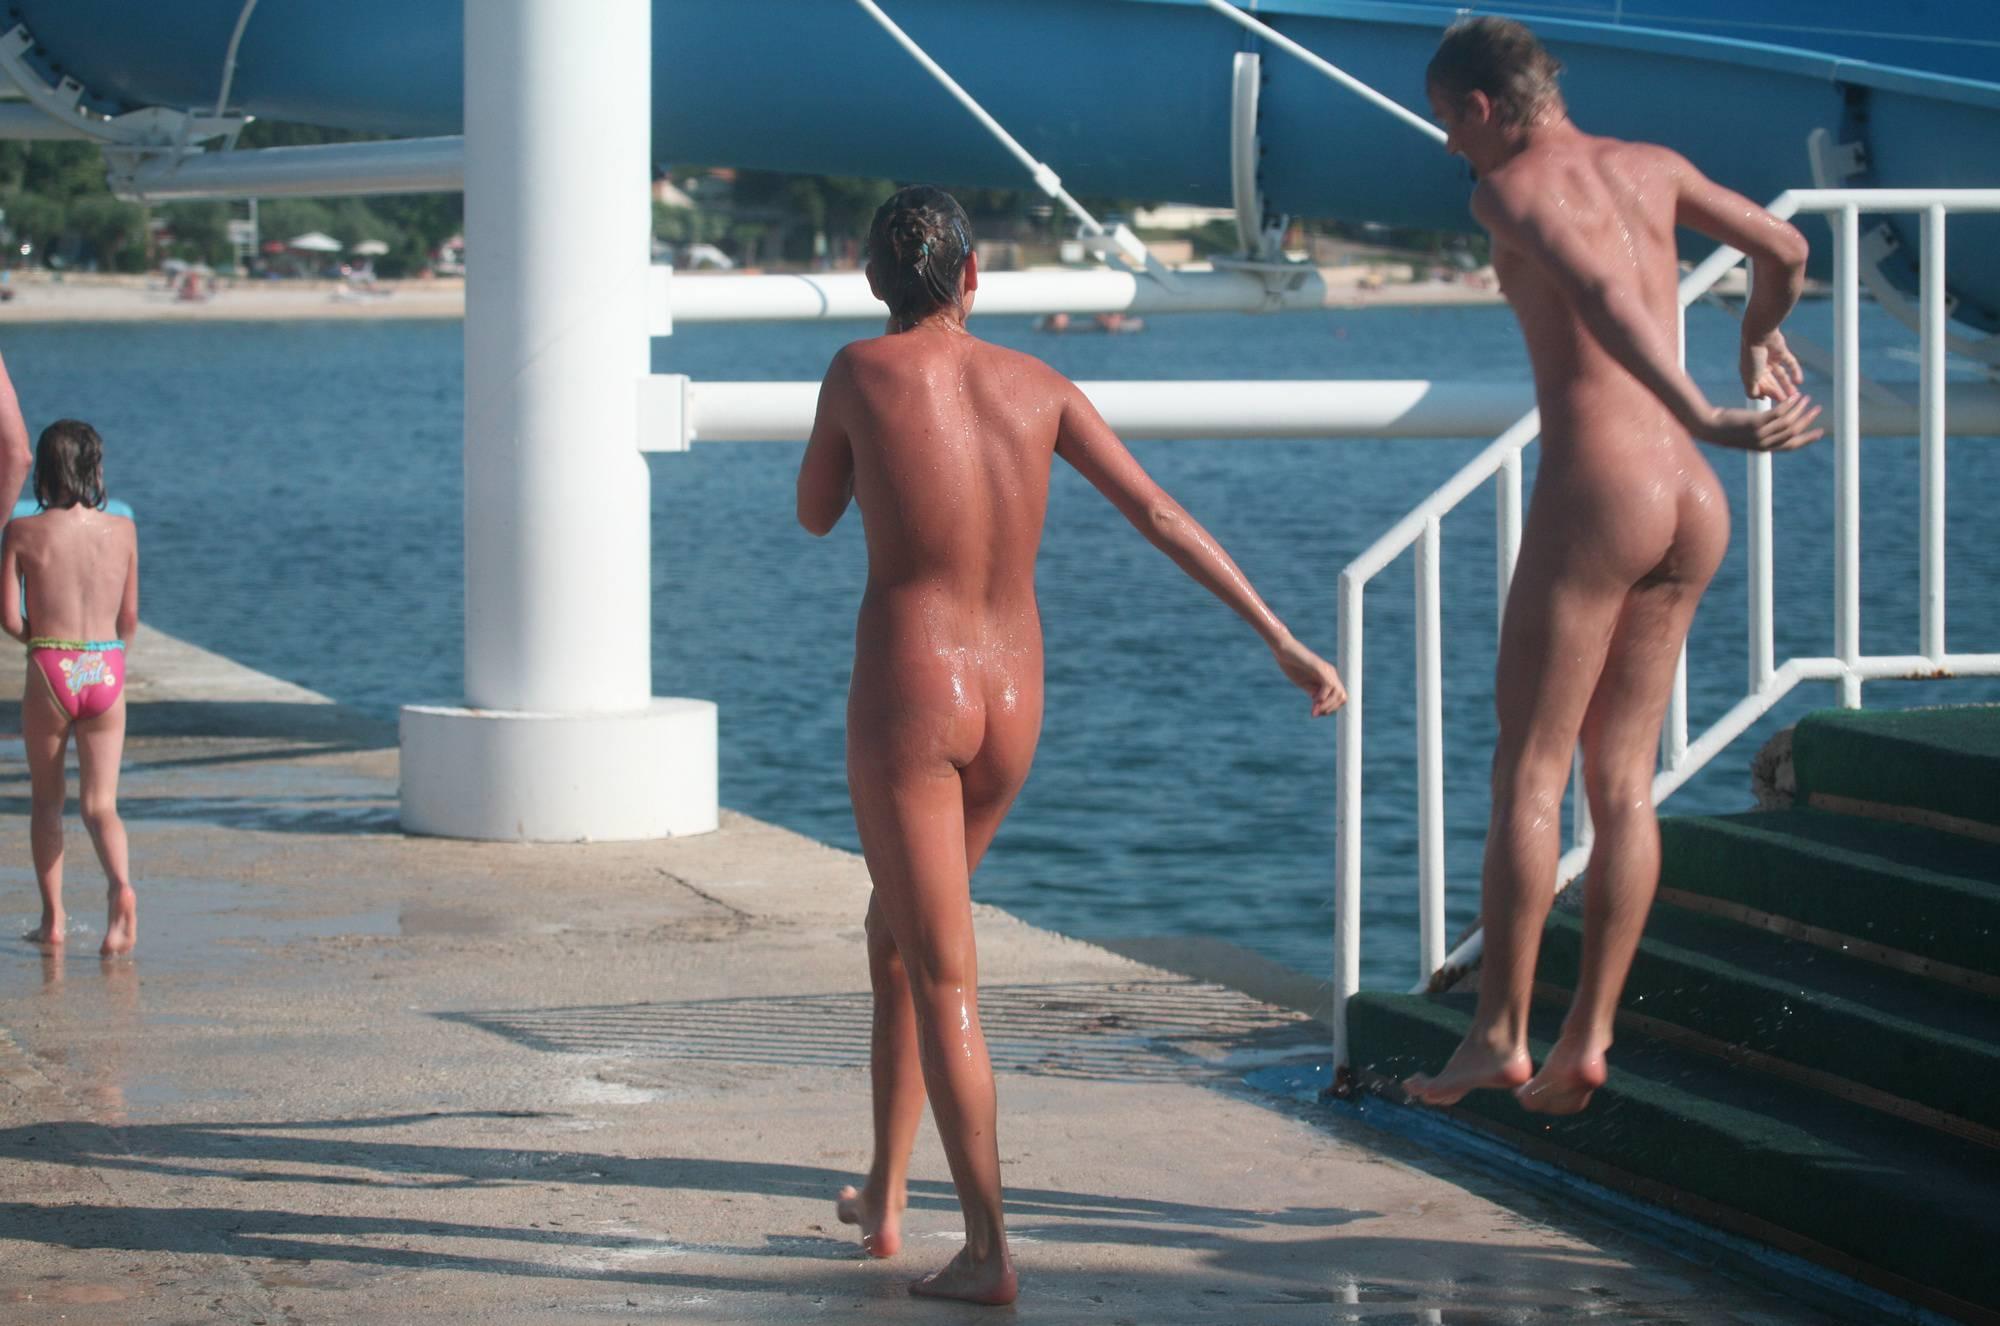 Nudist Pics Water Park Water Slides - 1